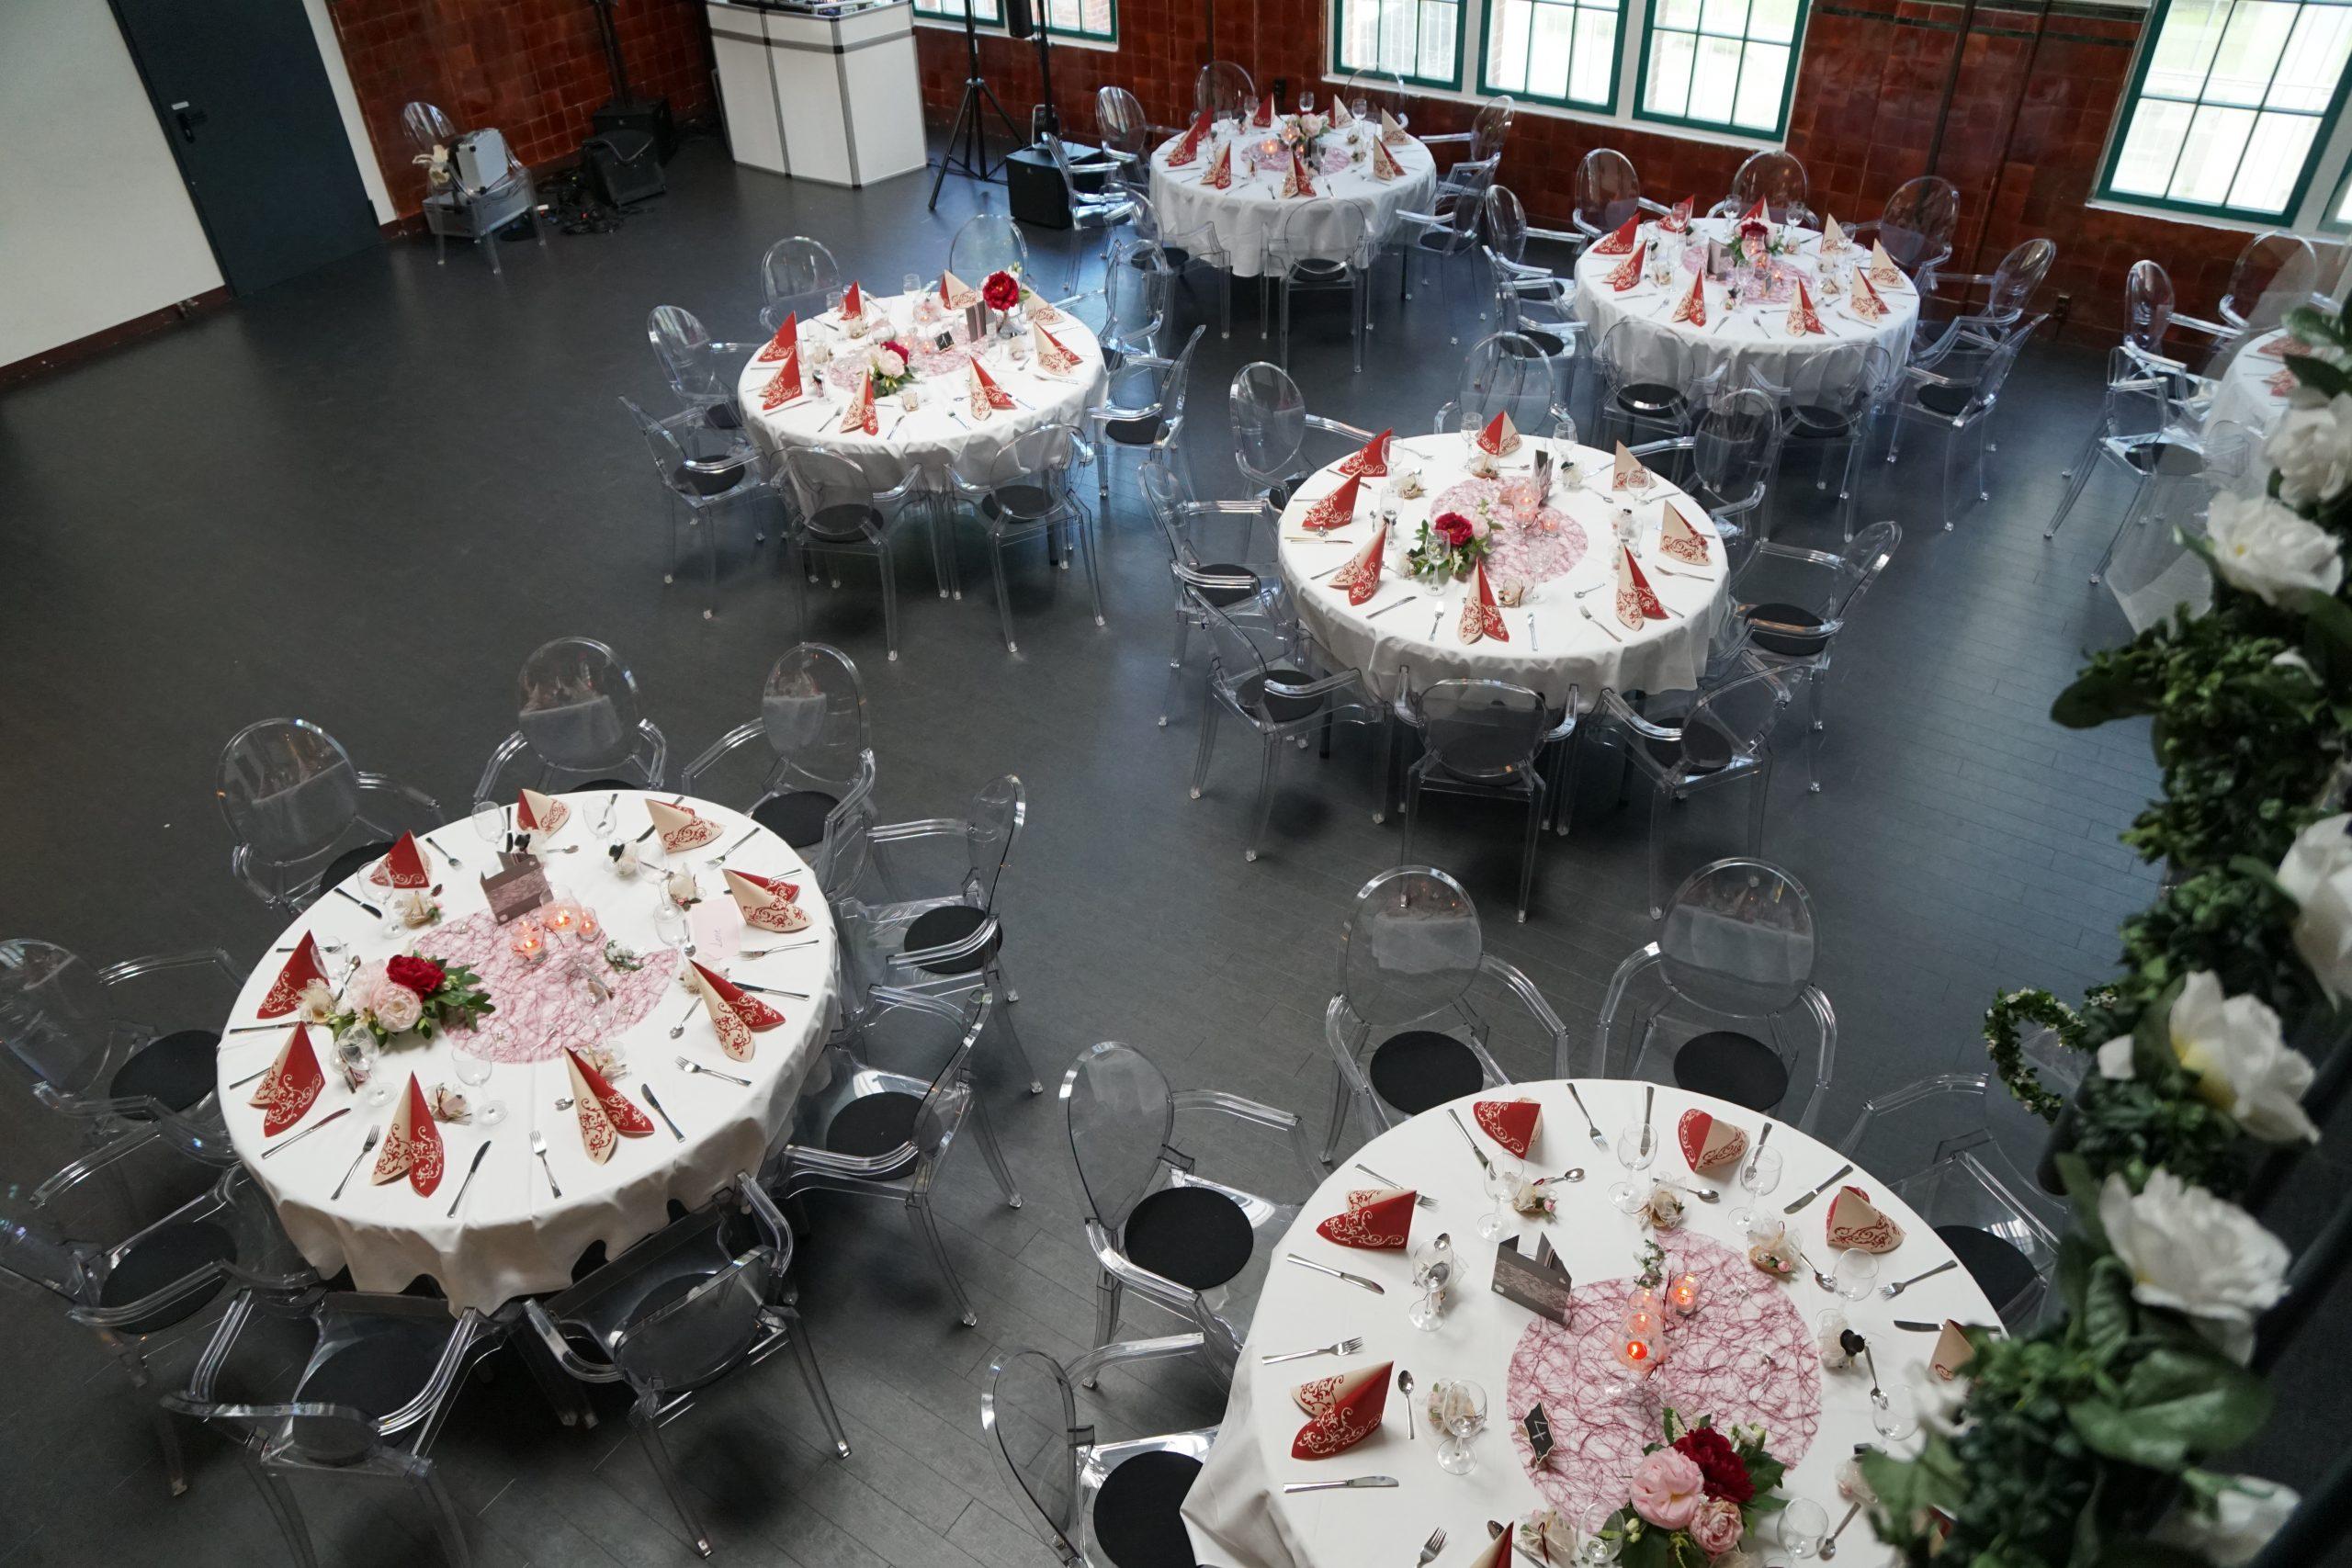 Hochzeitsdeko im The Mix Altrosa/Bordaux